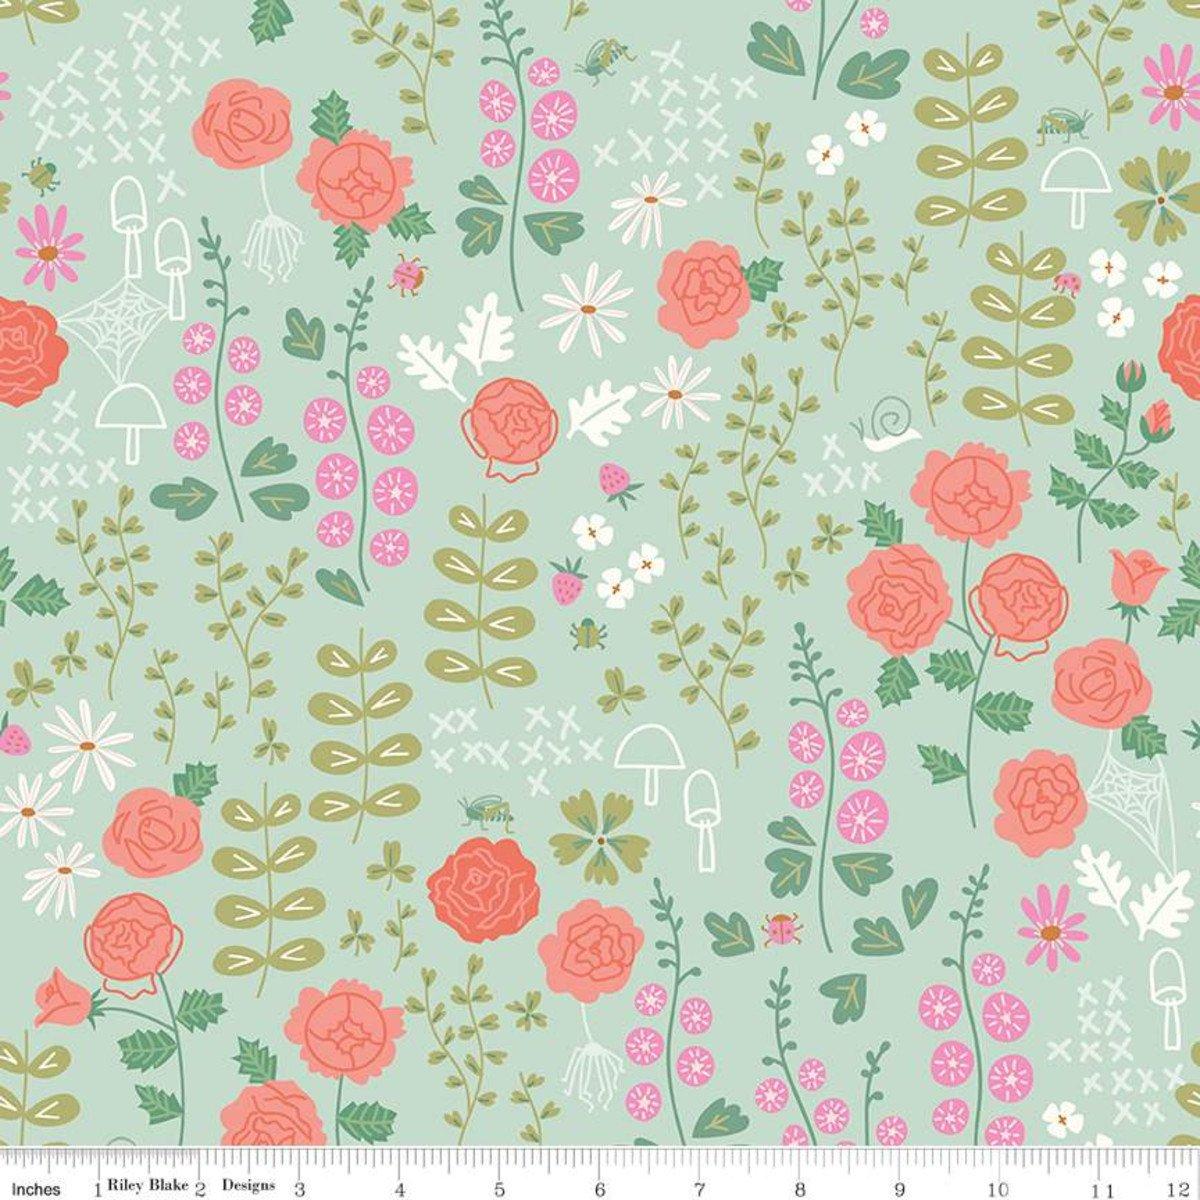 Rose Garden: Mint - New Dawn - Citrus & Mint Designs - Riley Blake Designs